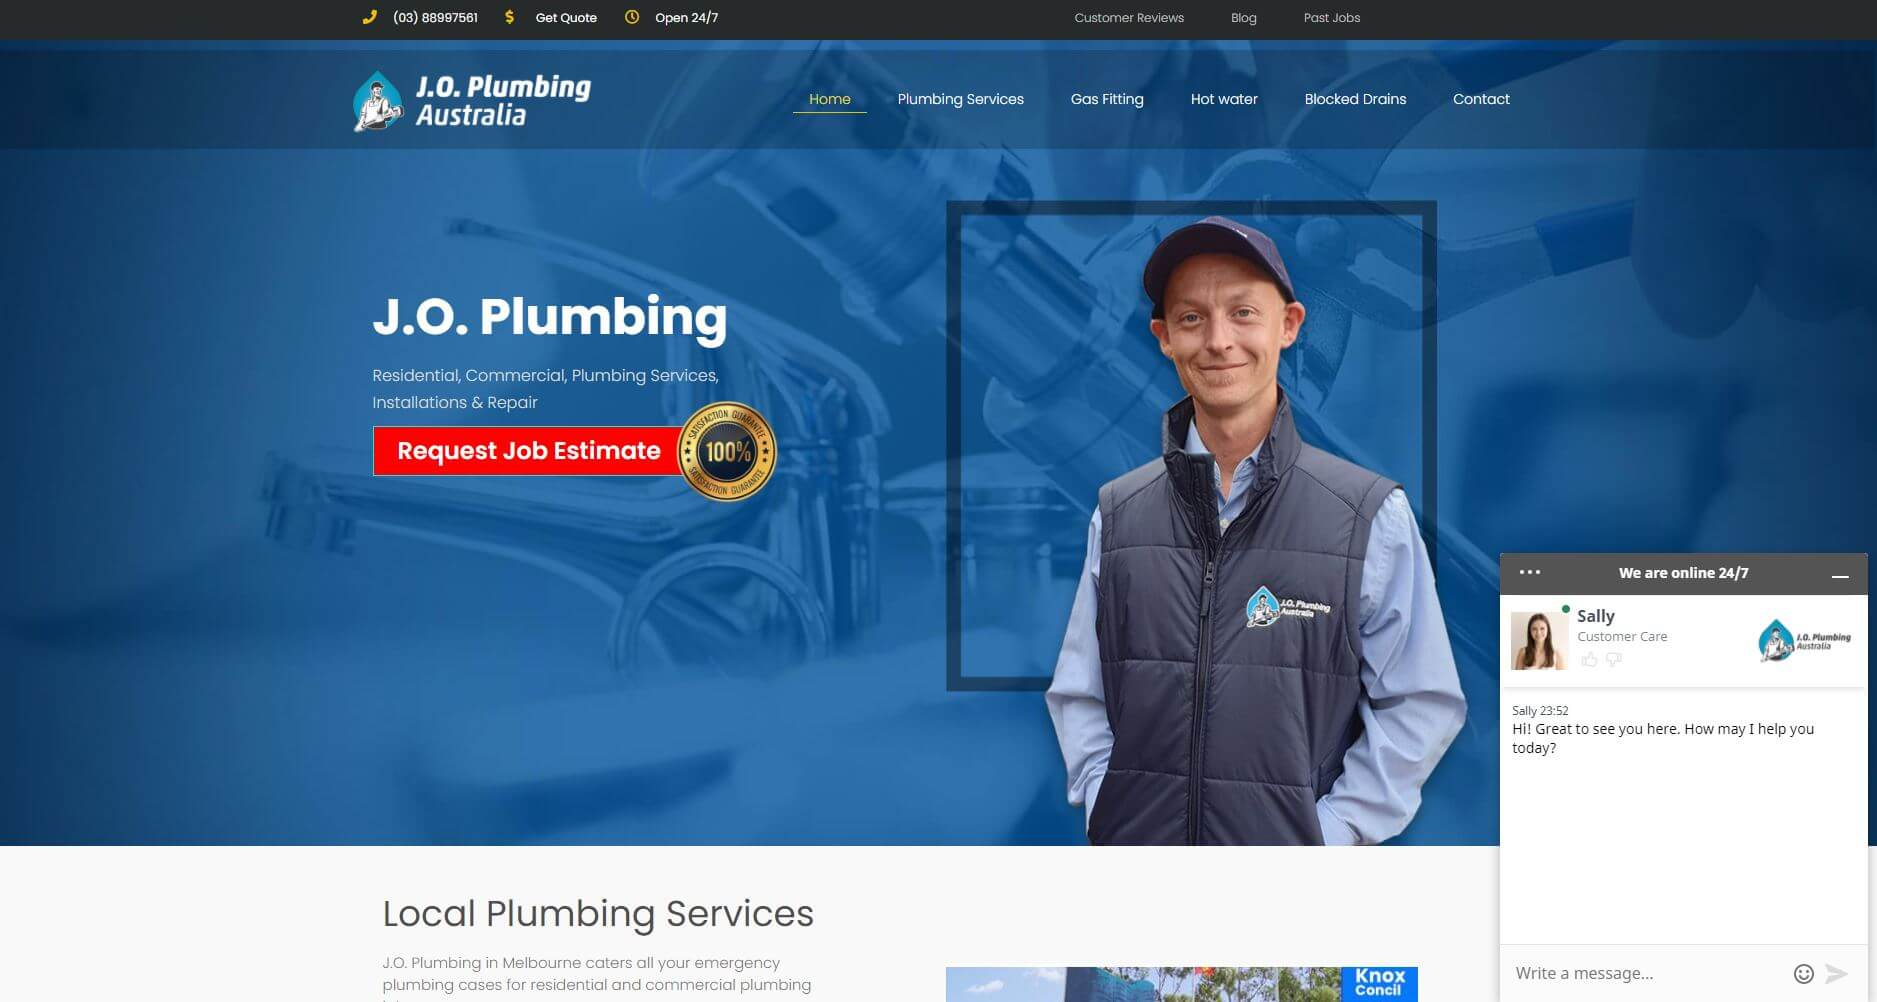 J.o. Plumbing